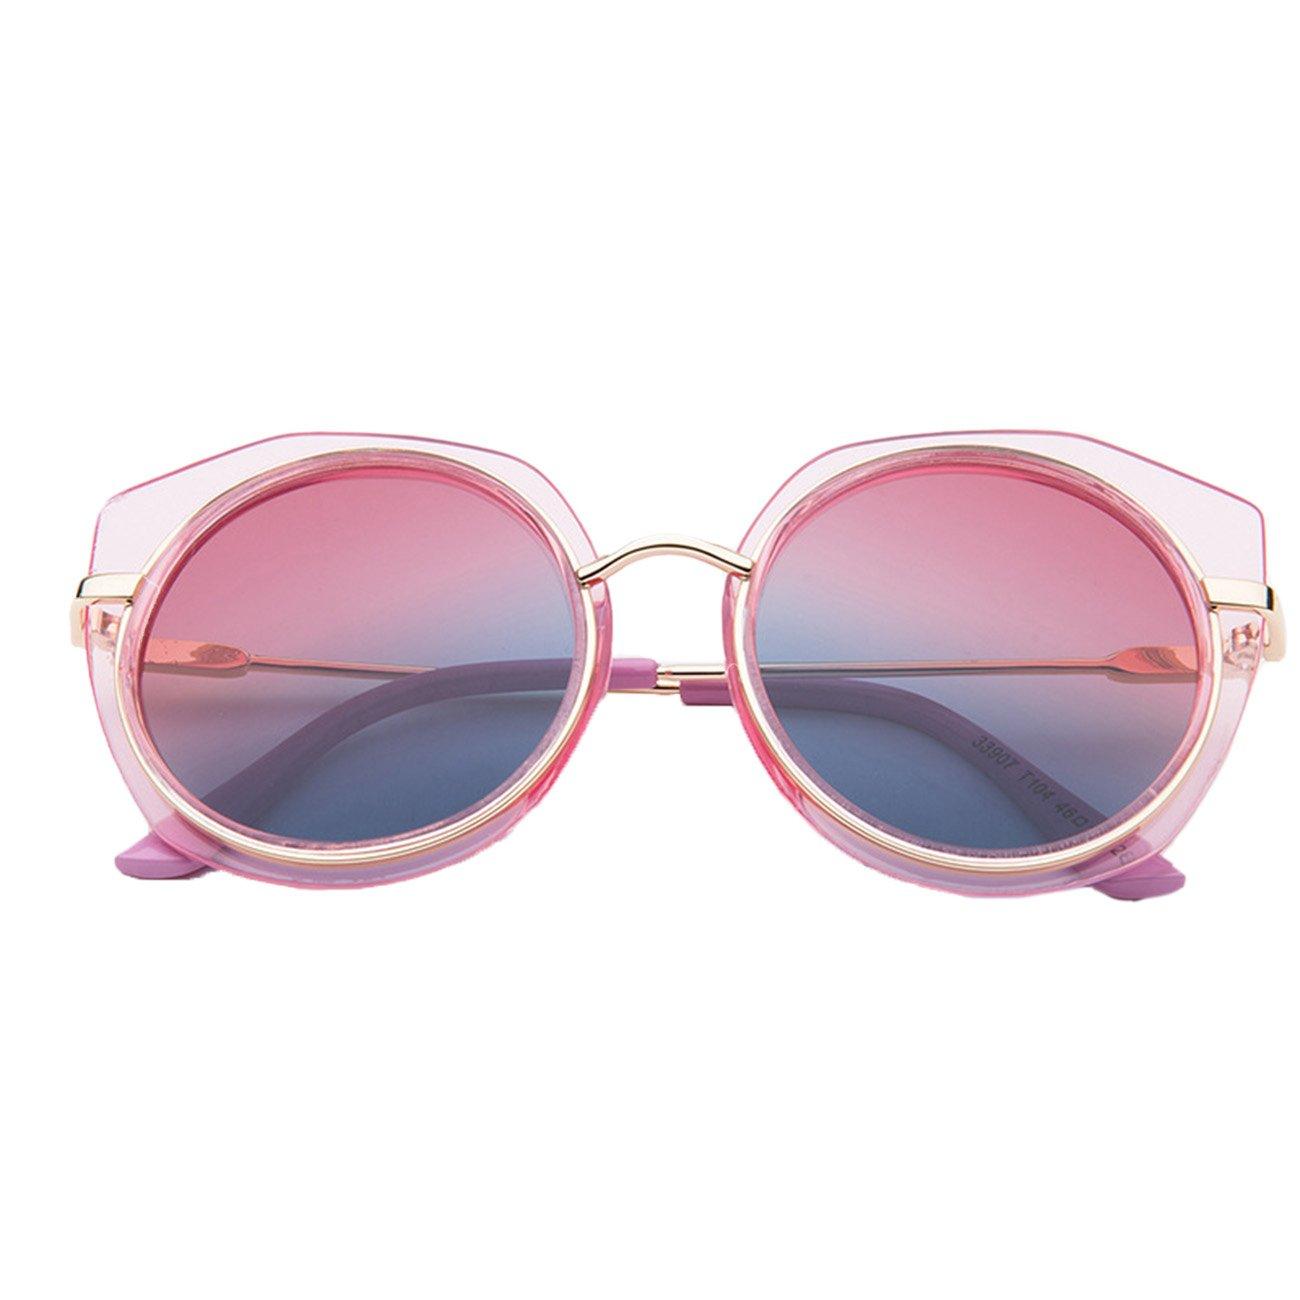 Lemonkid Kids Sunglasses UV Protection Metal Arrow for Boys Girls Pink Mirror width 13.5cm